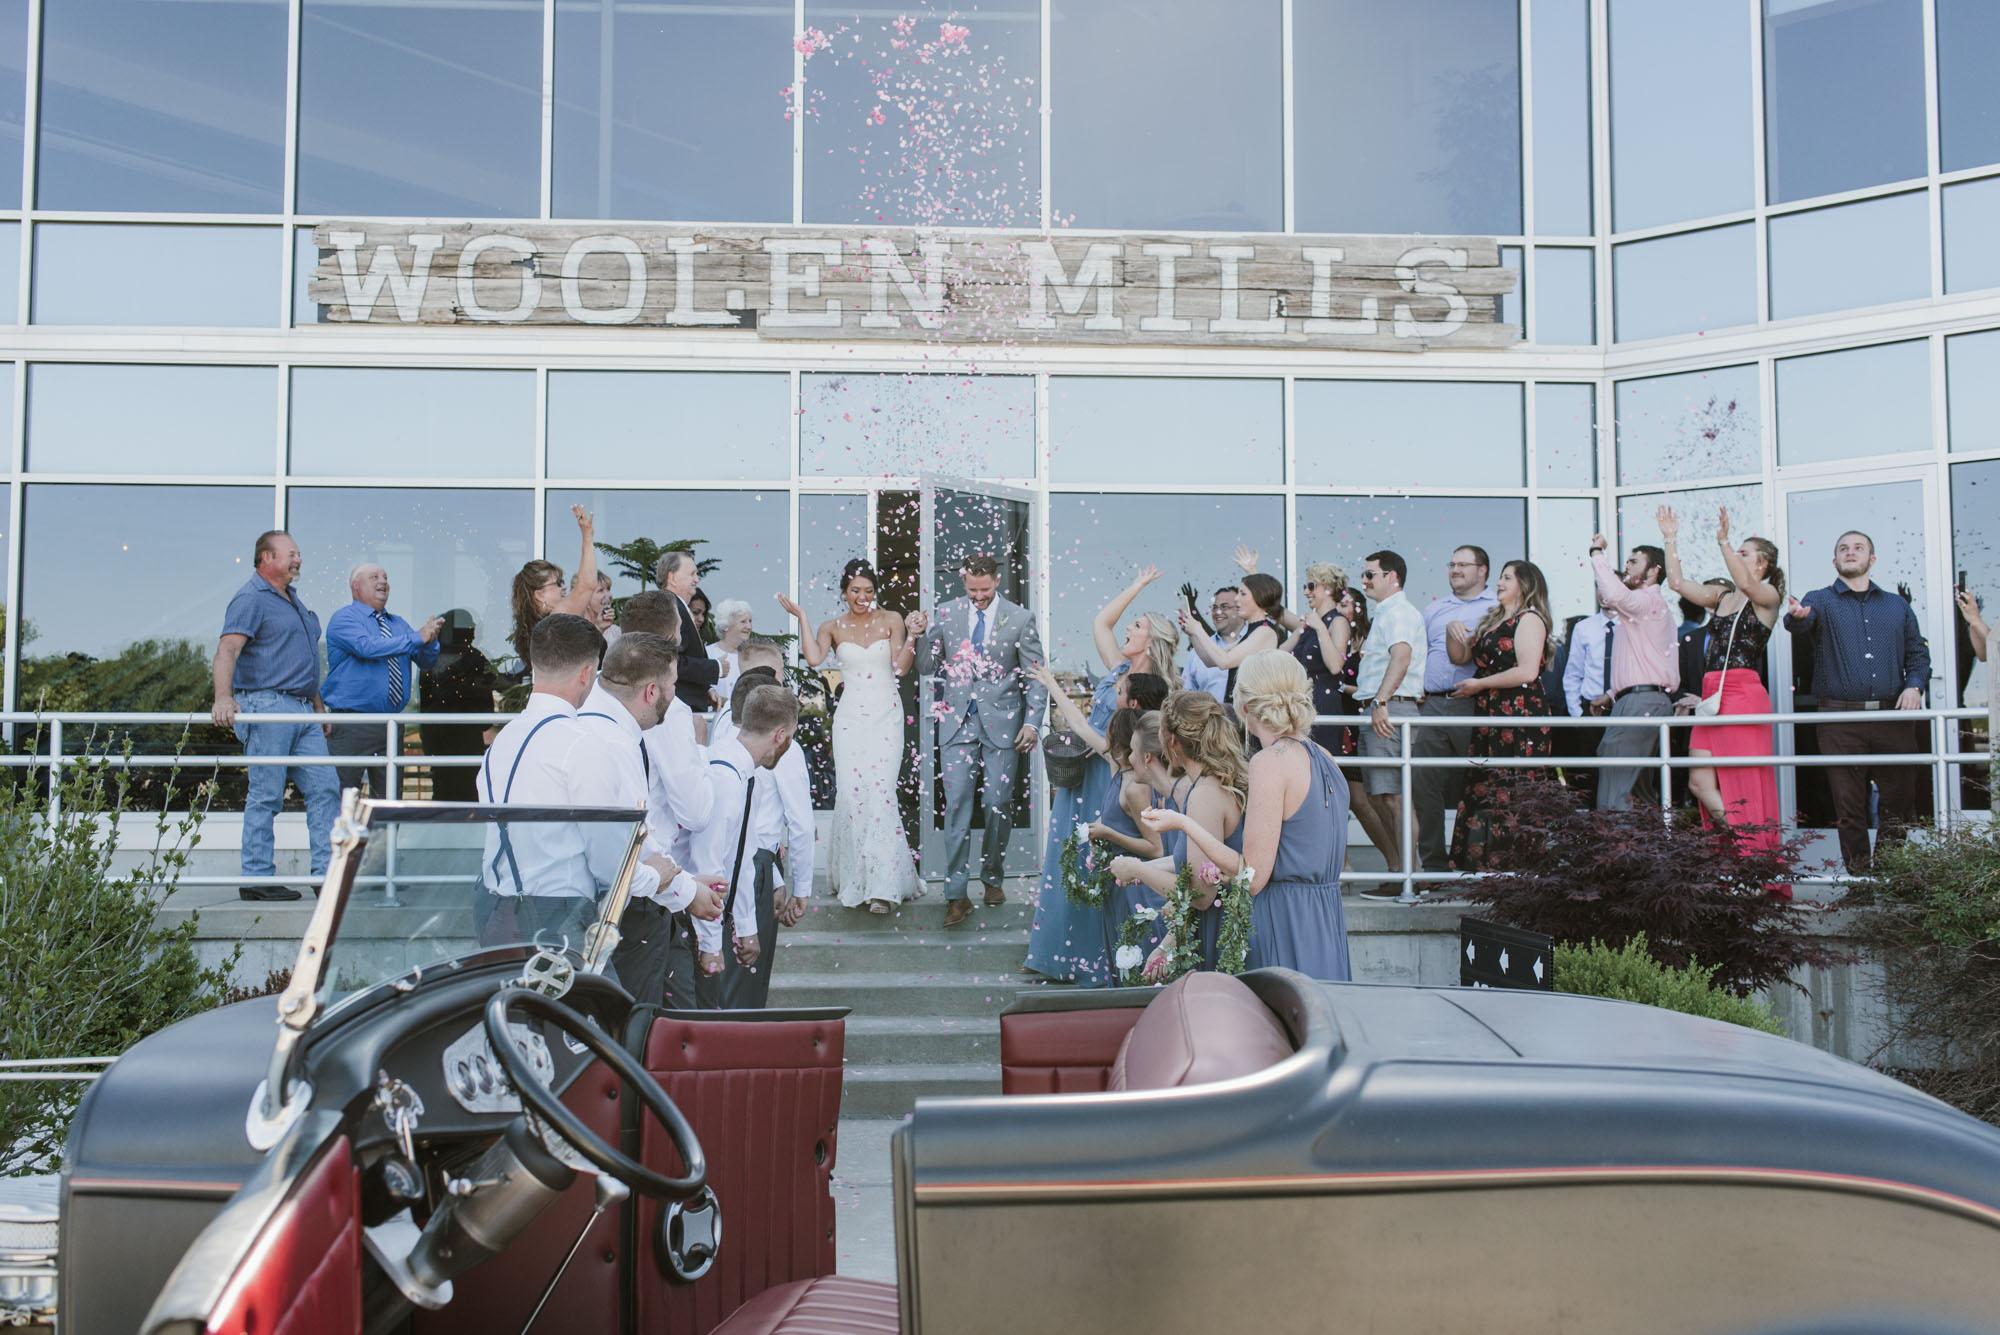 Gavyn-Taylor-Photo_Woolen-Mills-Wedding (76 of 143).jpg